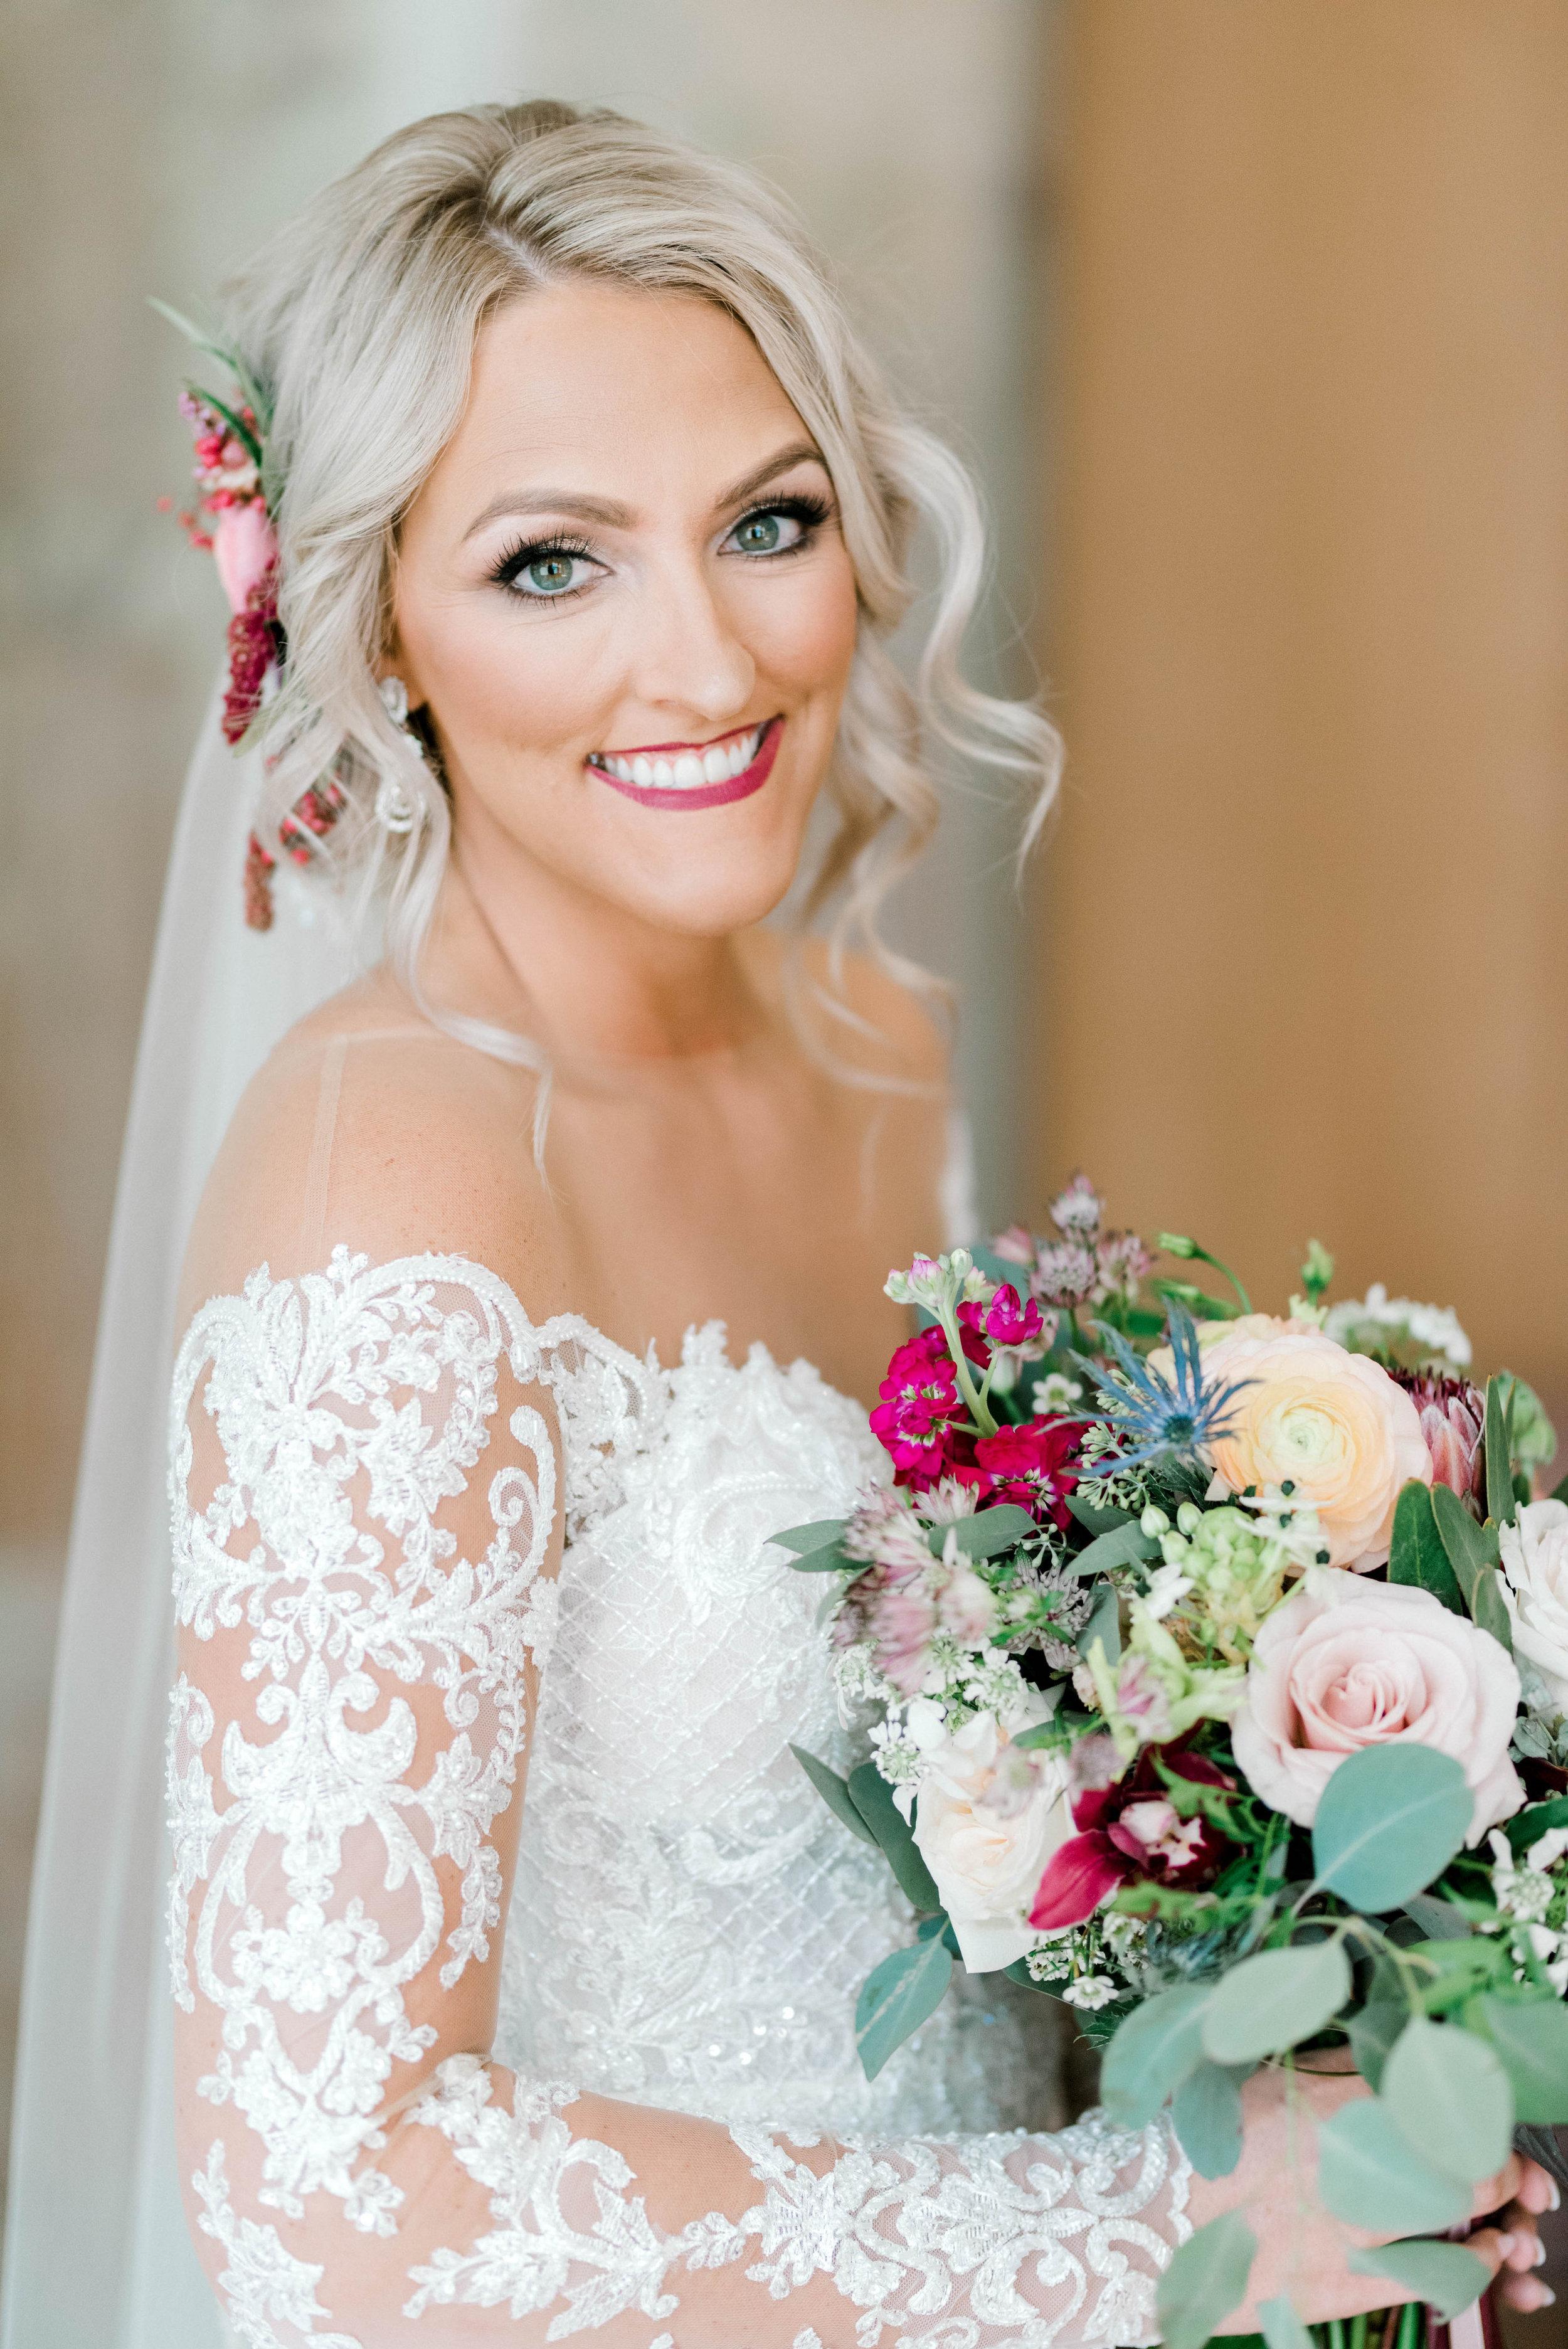 Ryan Alexa Married-Getting Ready First Look-0167.jpg